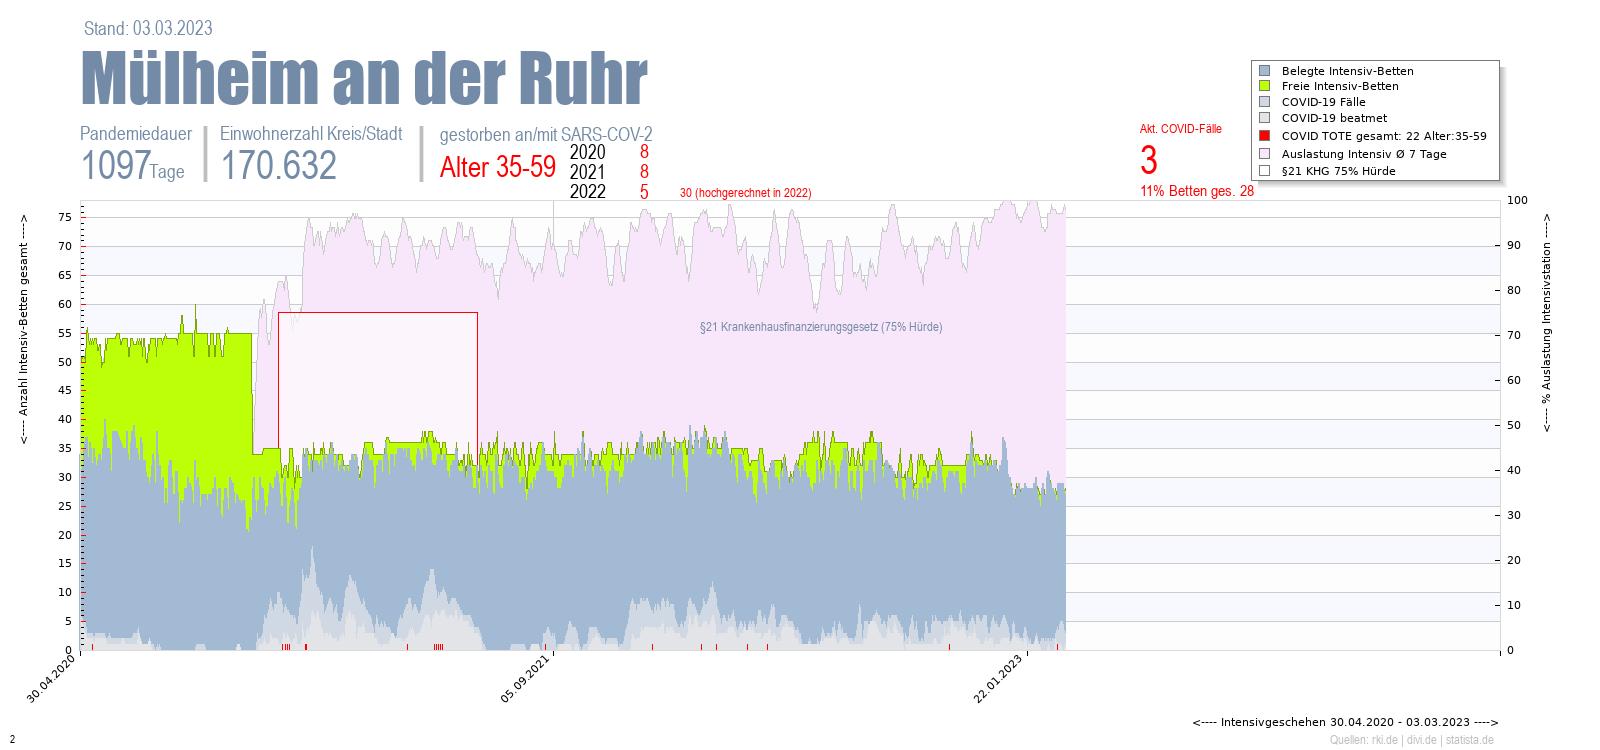 Intensivstation Auslastung Mülheim an der Ruhr Alter 0-4